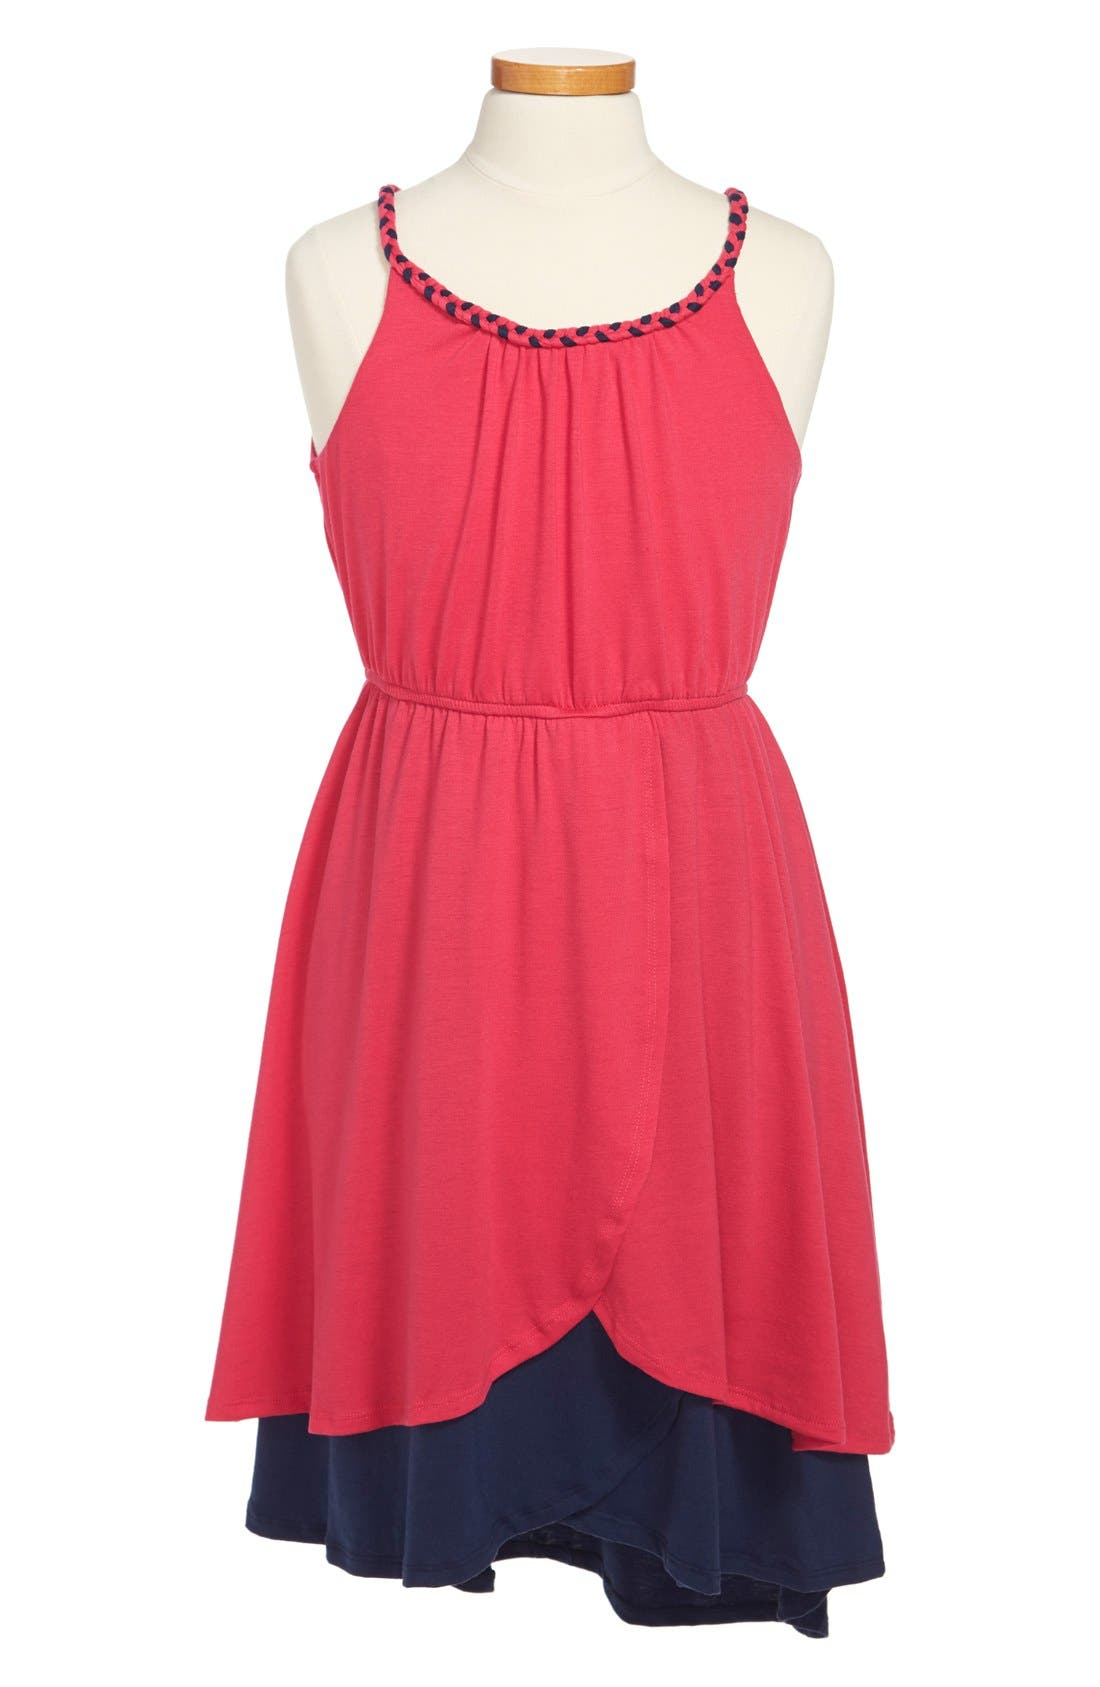 Main Image - Paper Doll Colorblock Tulip Skirt Dress (Little Girls & Big Girls)